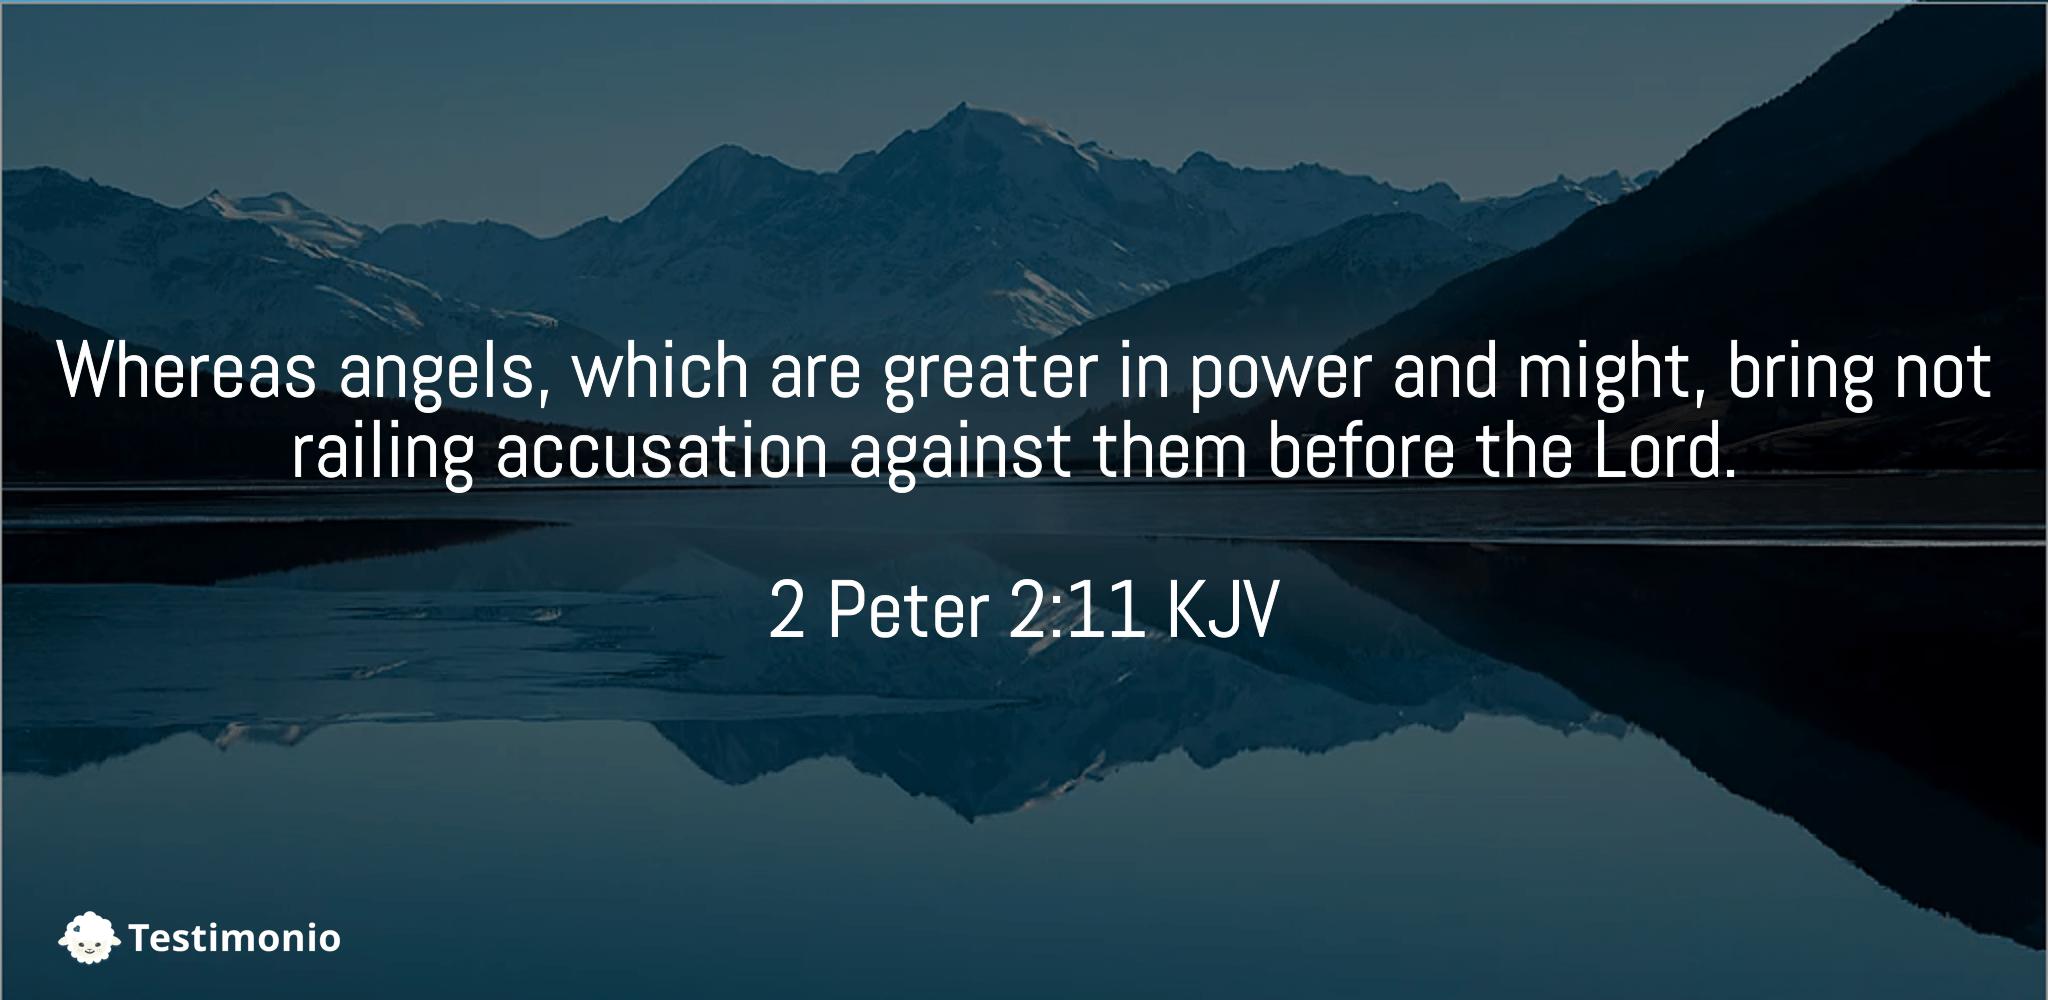 2 Peter 2:11